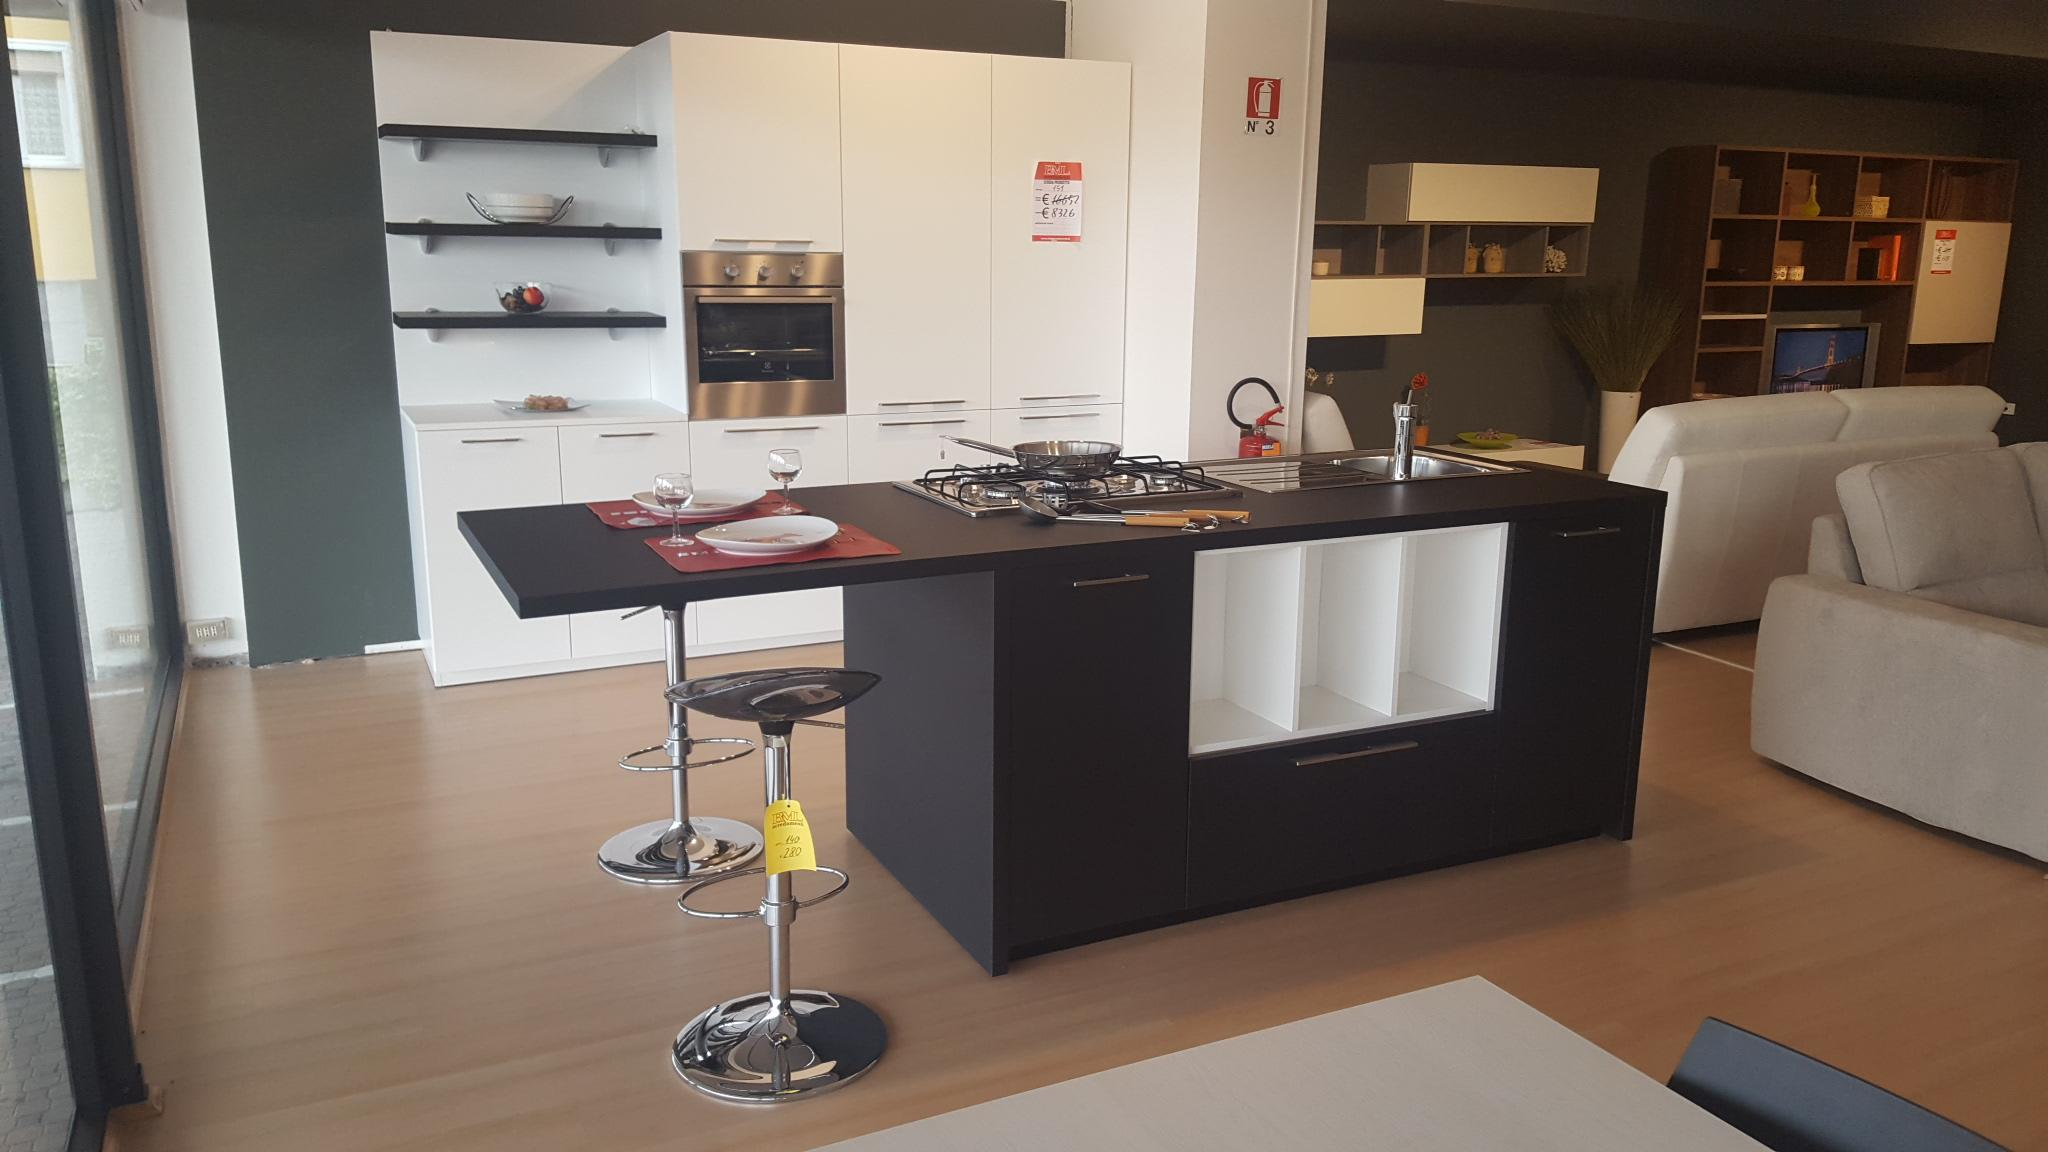 Cucina bianca e nera outlet mobili e arredamento a for Outlet arredamento vicenza